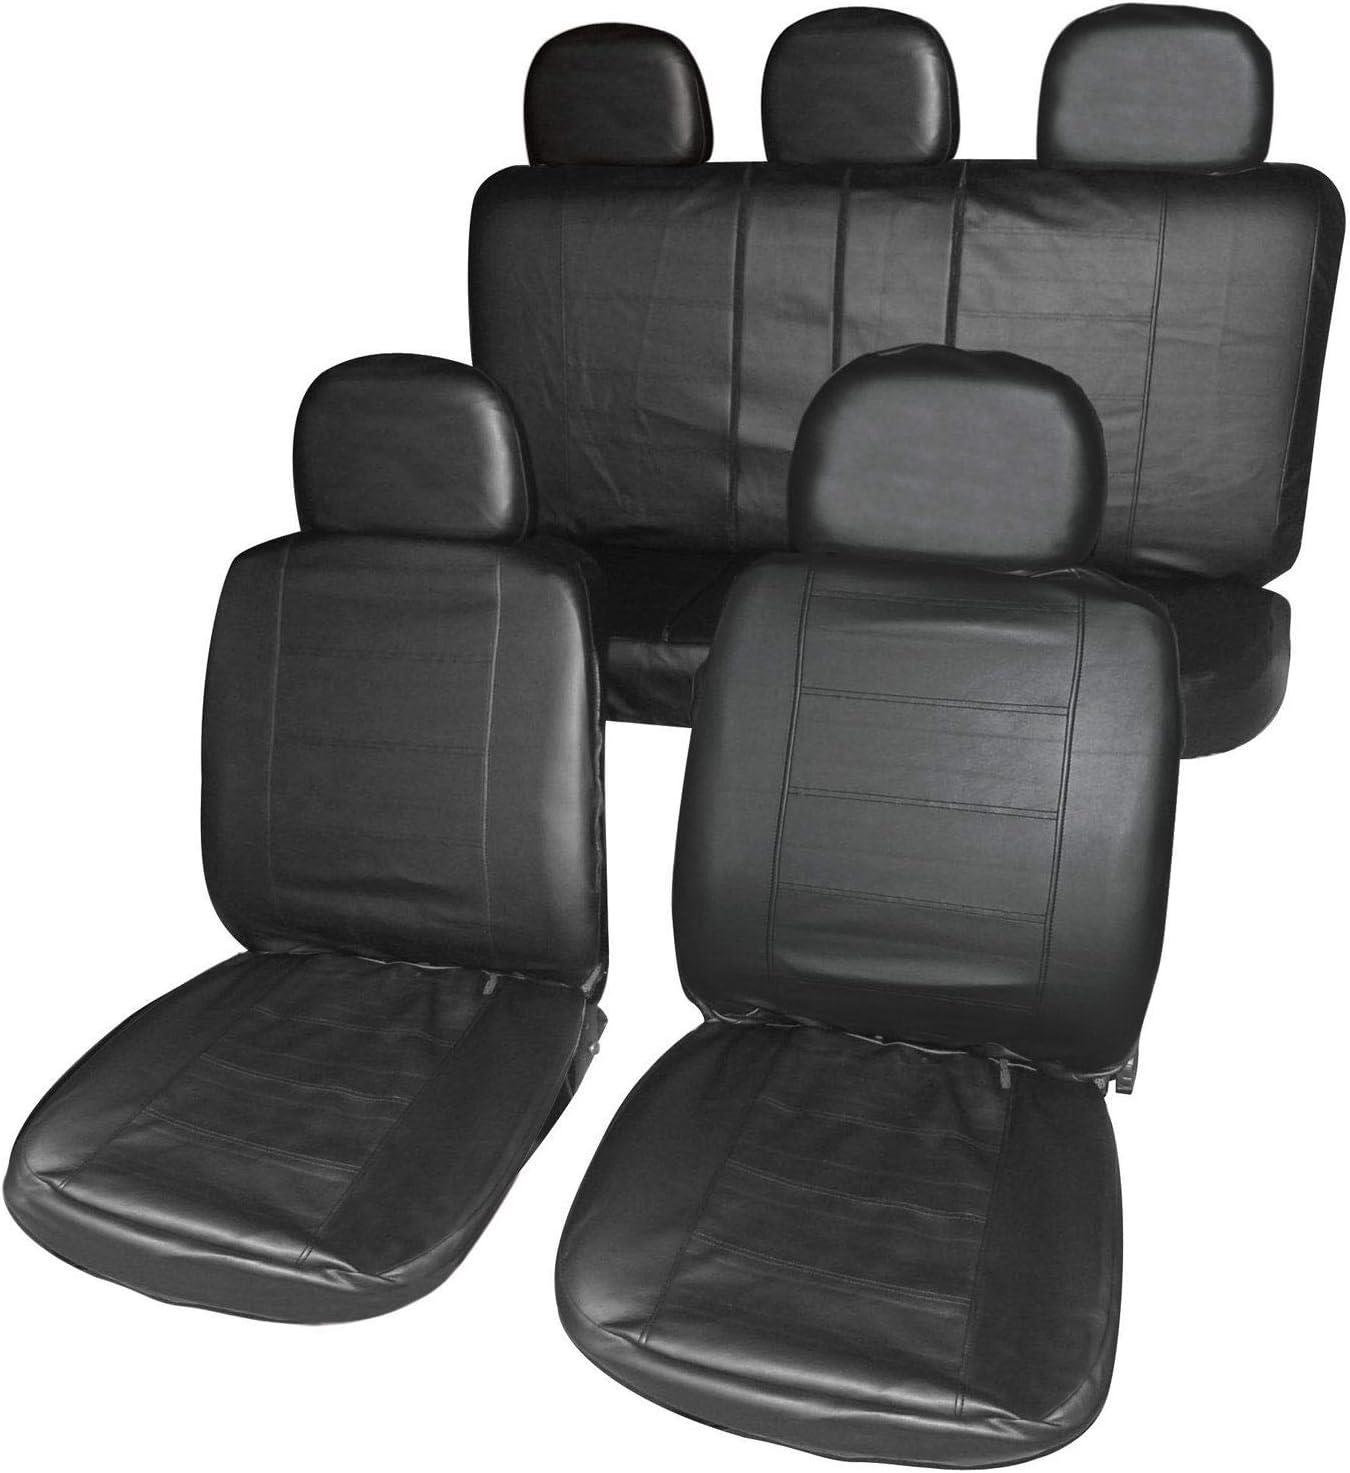 UKB4C Leatherette Full Set Front /& Rear Car Seat Covers for Mitsubishi L200 Pickup